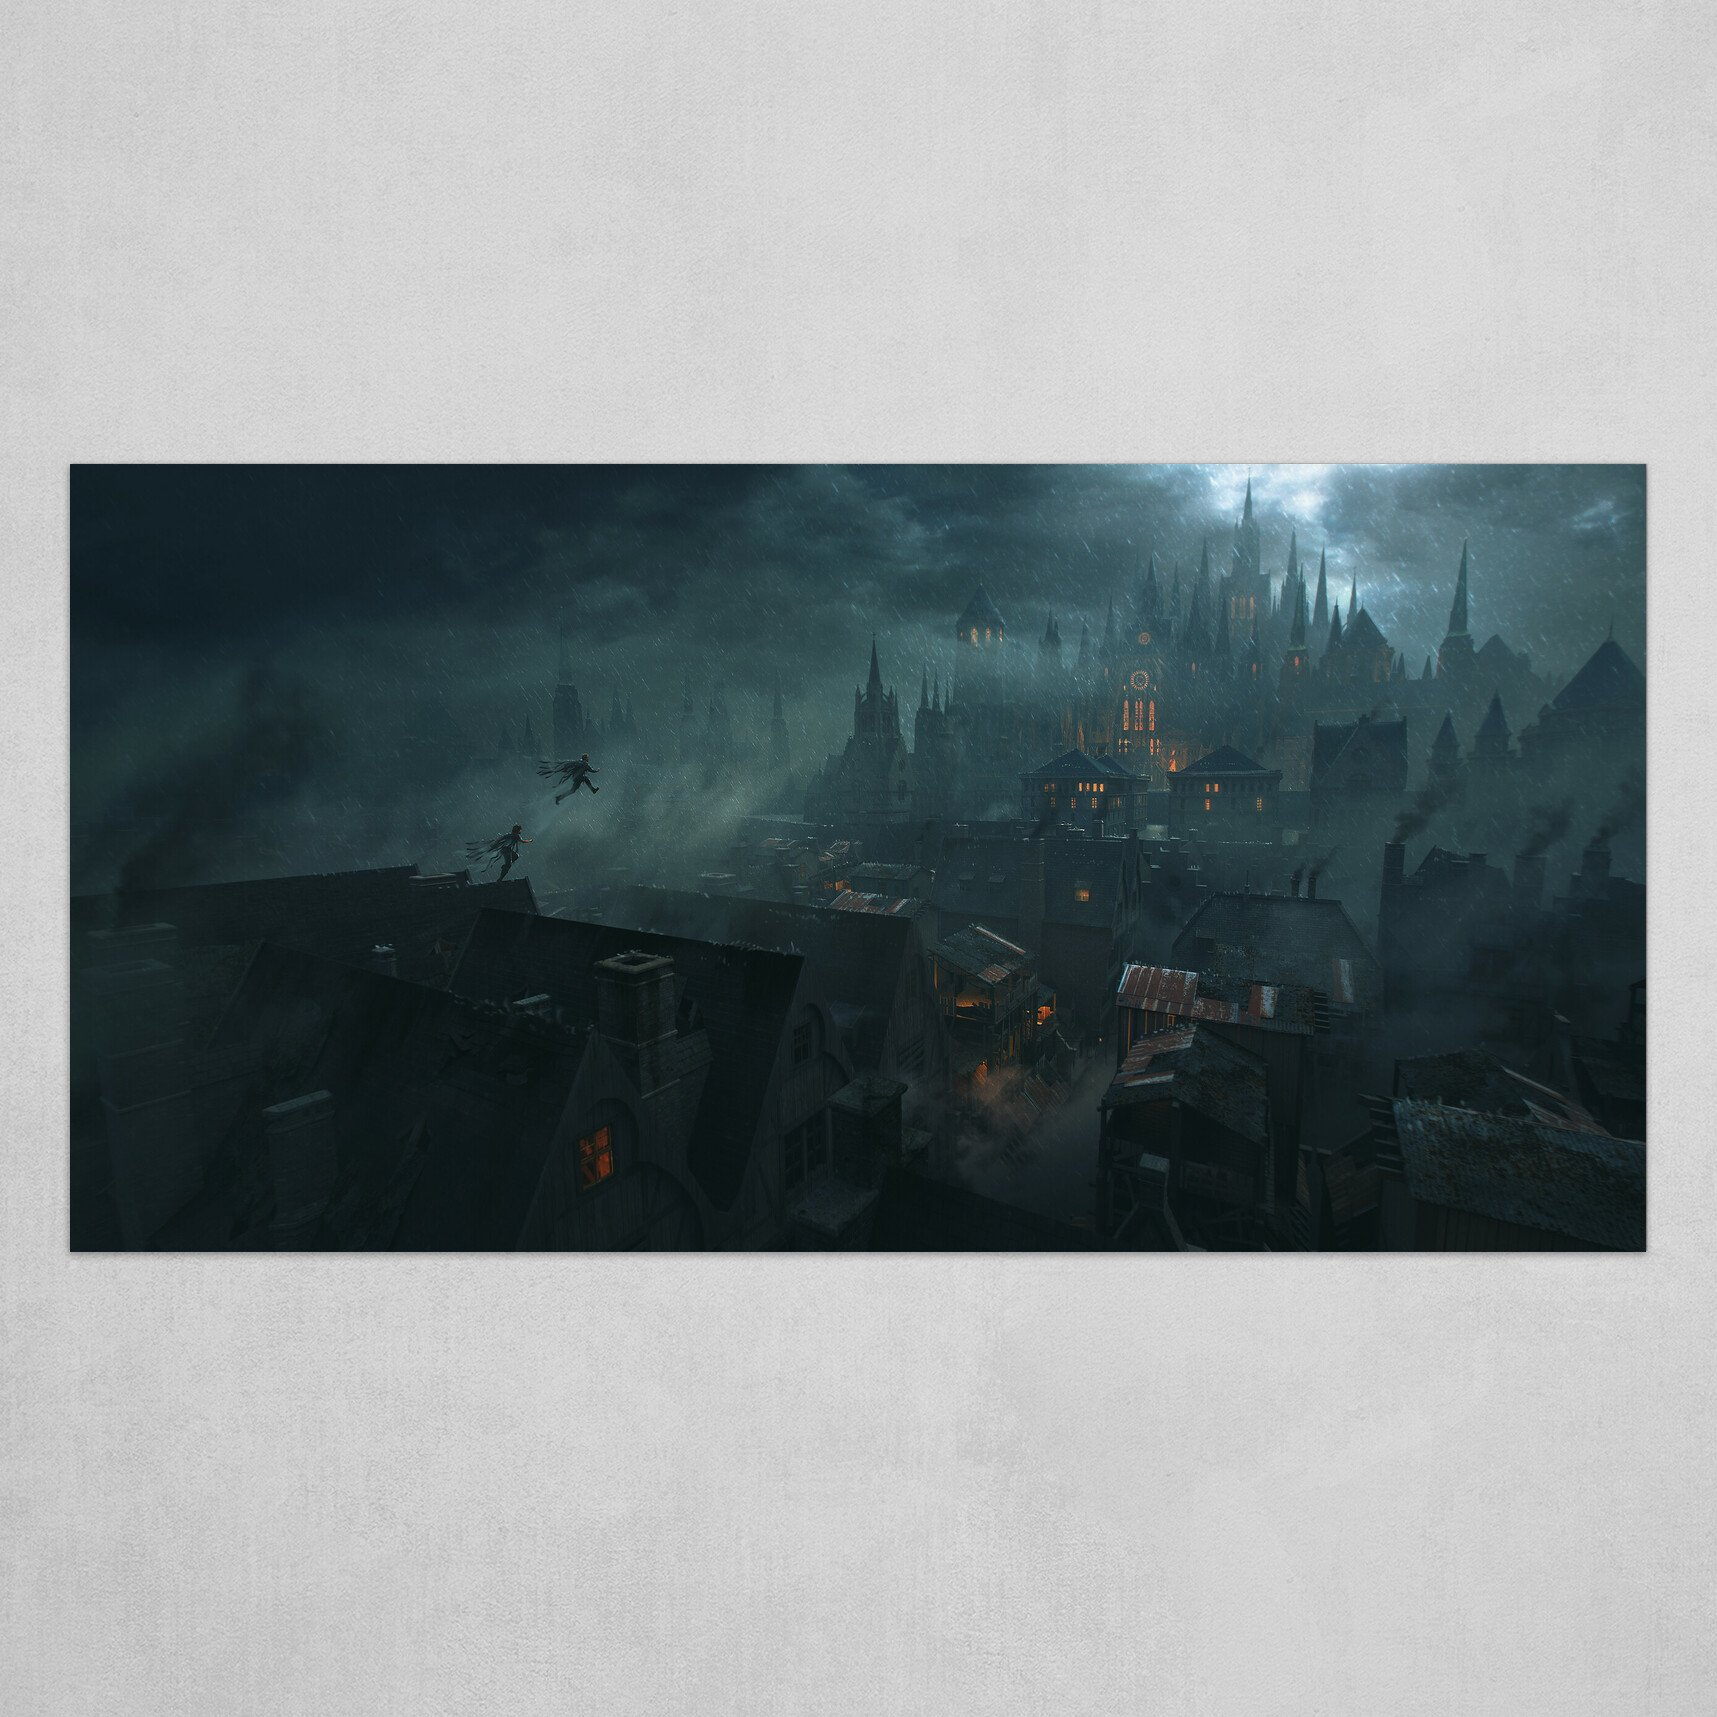 Mistborn: Luthadel at Night